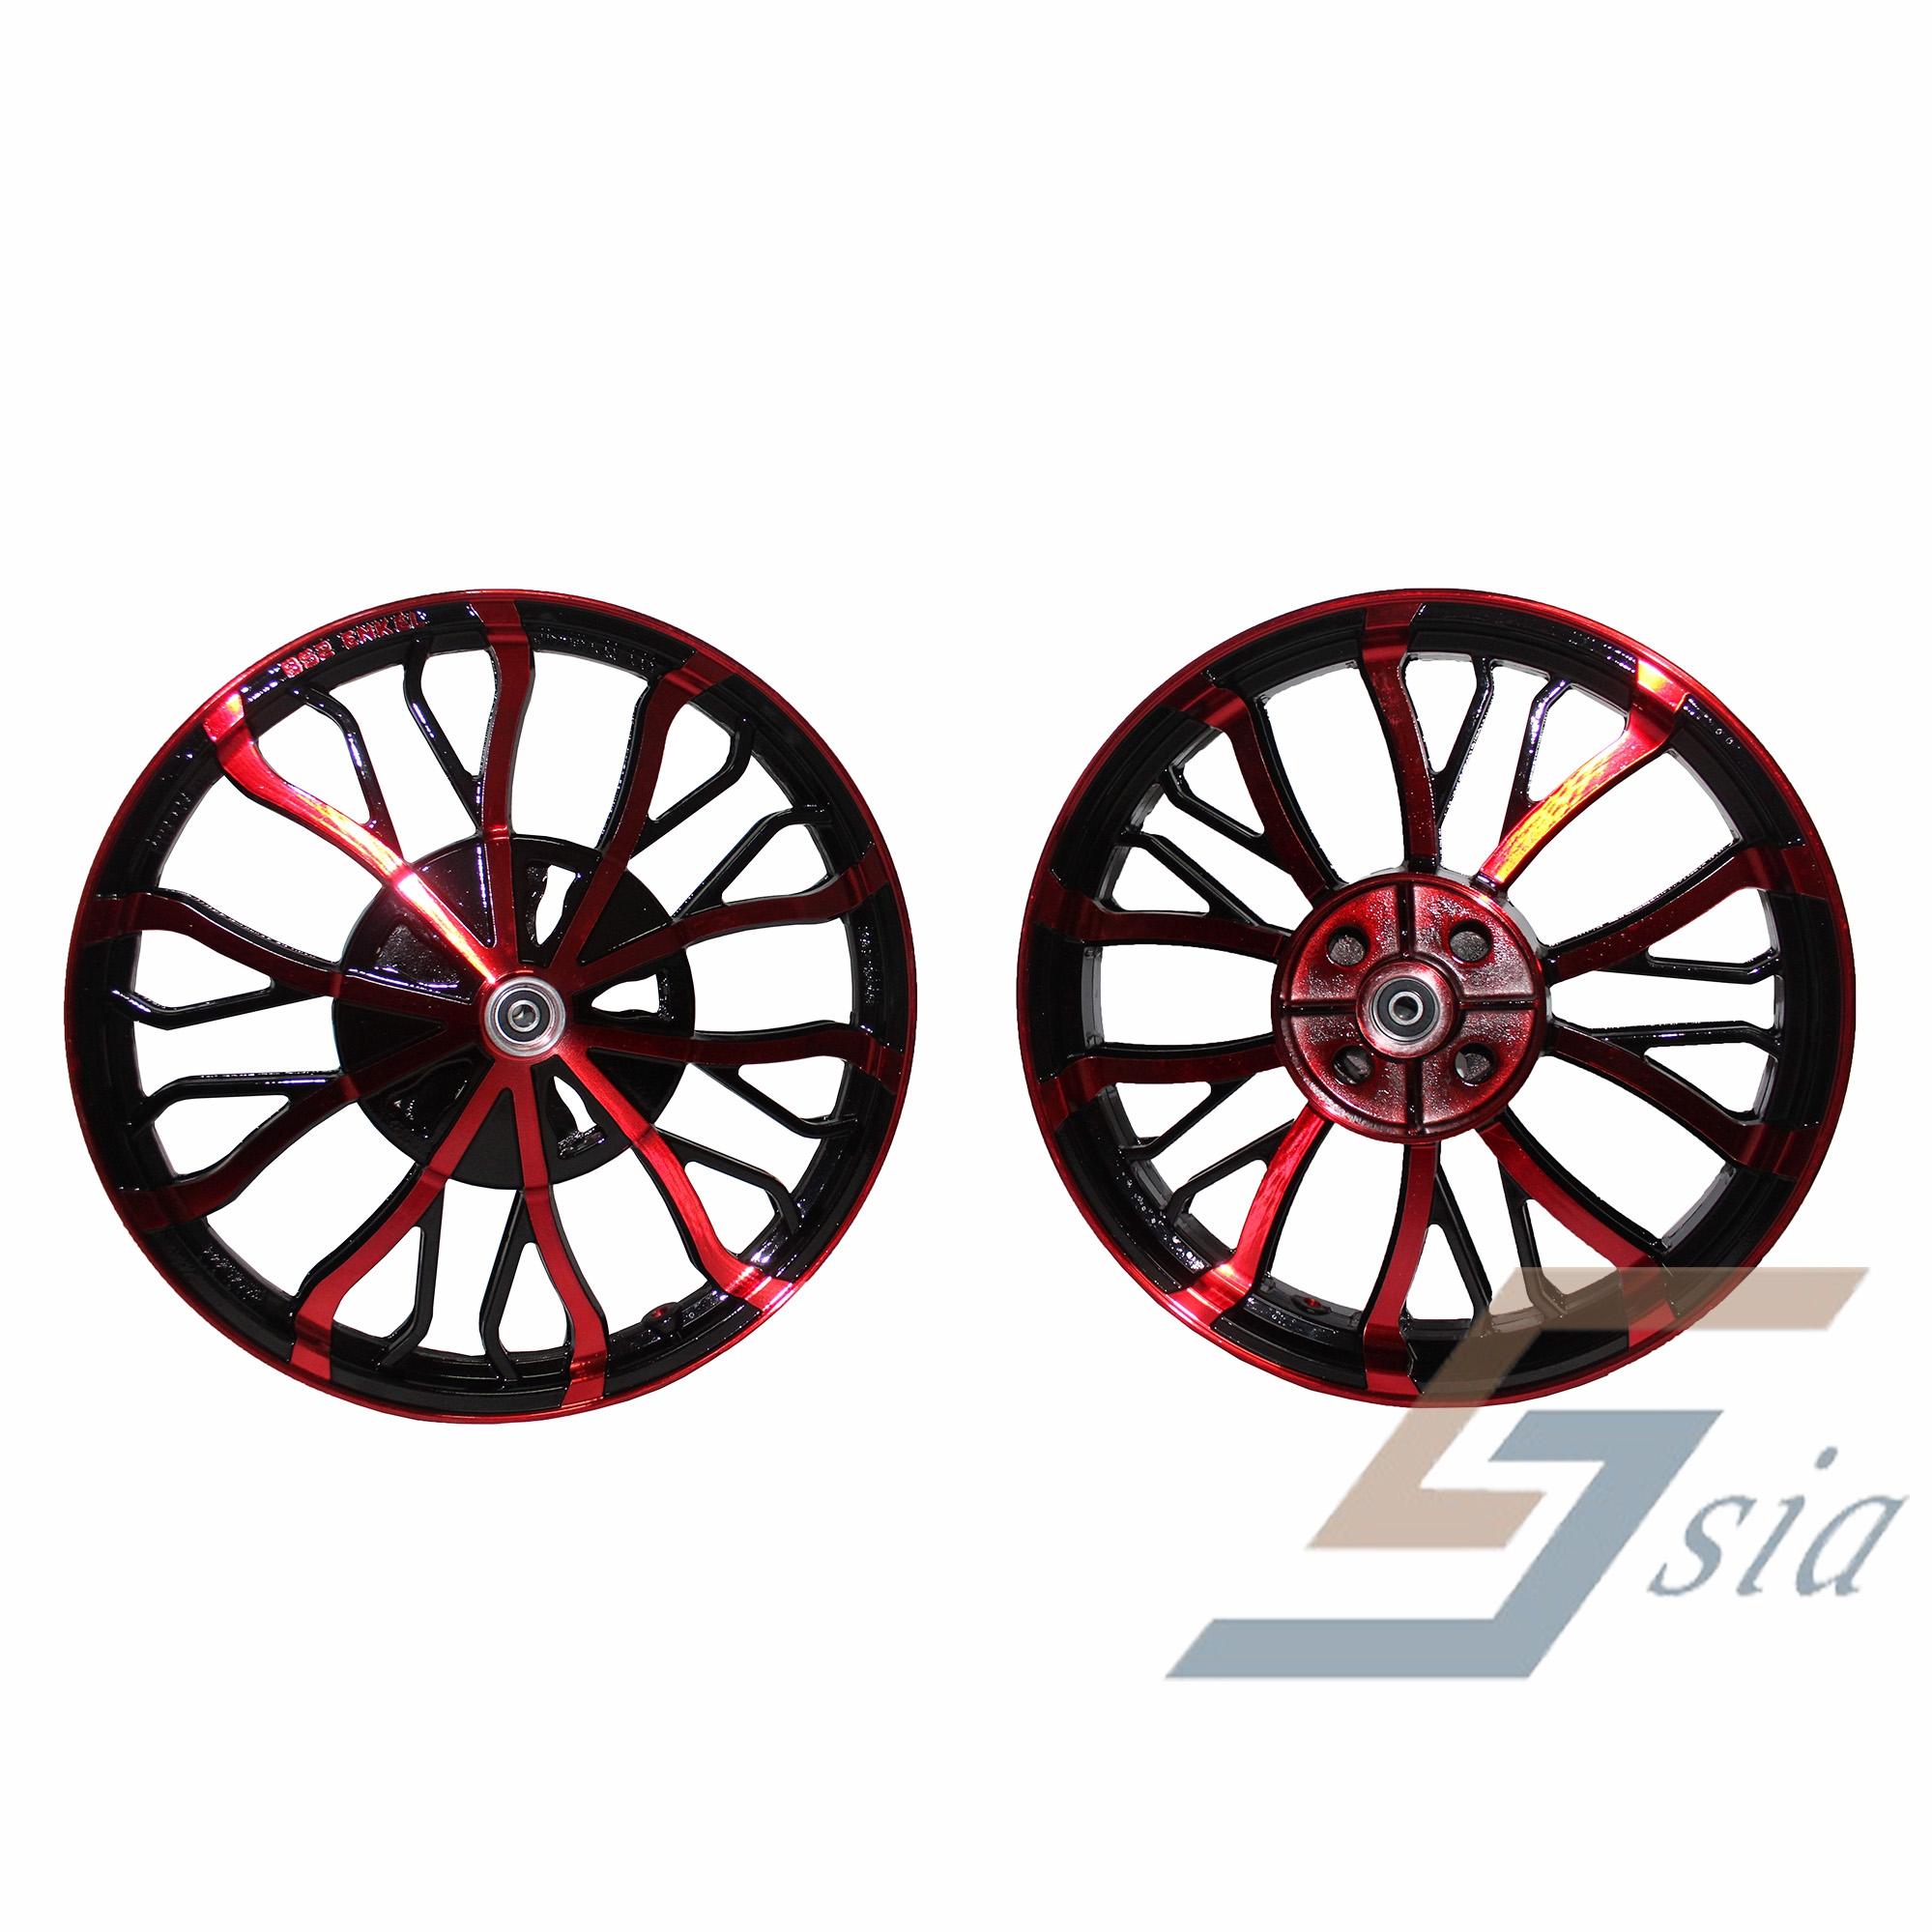 Honda RS150R BS2 Racing Sport Rims (Red/Black)